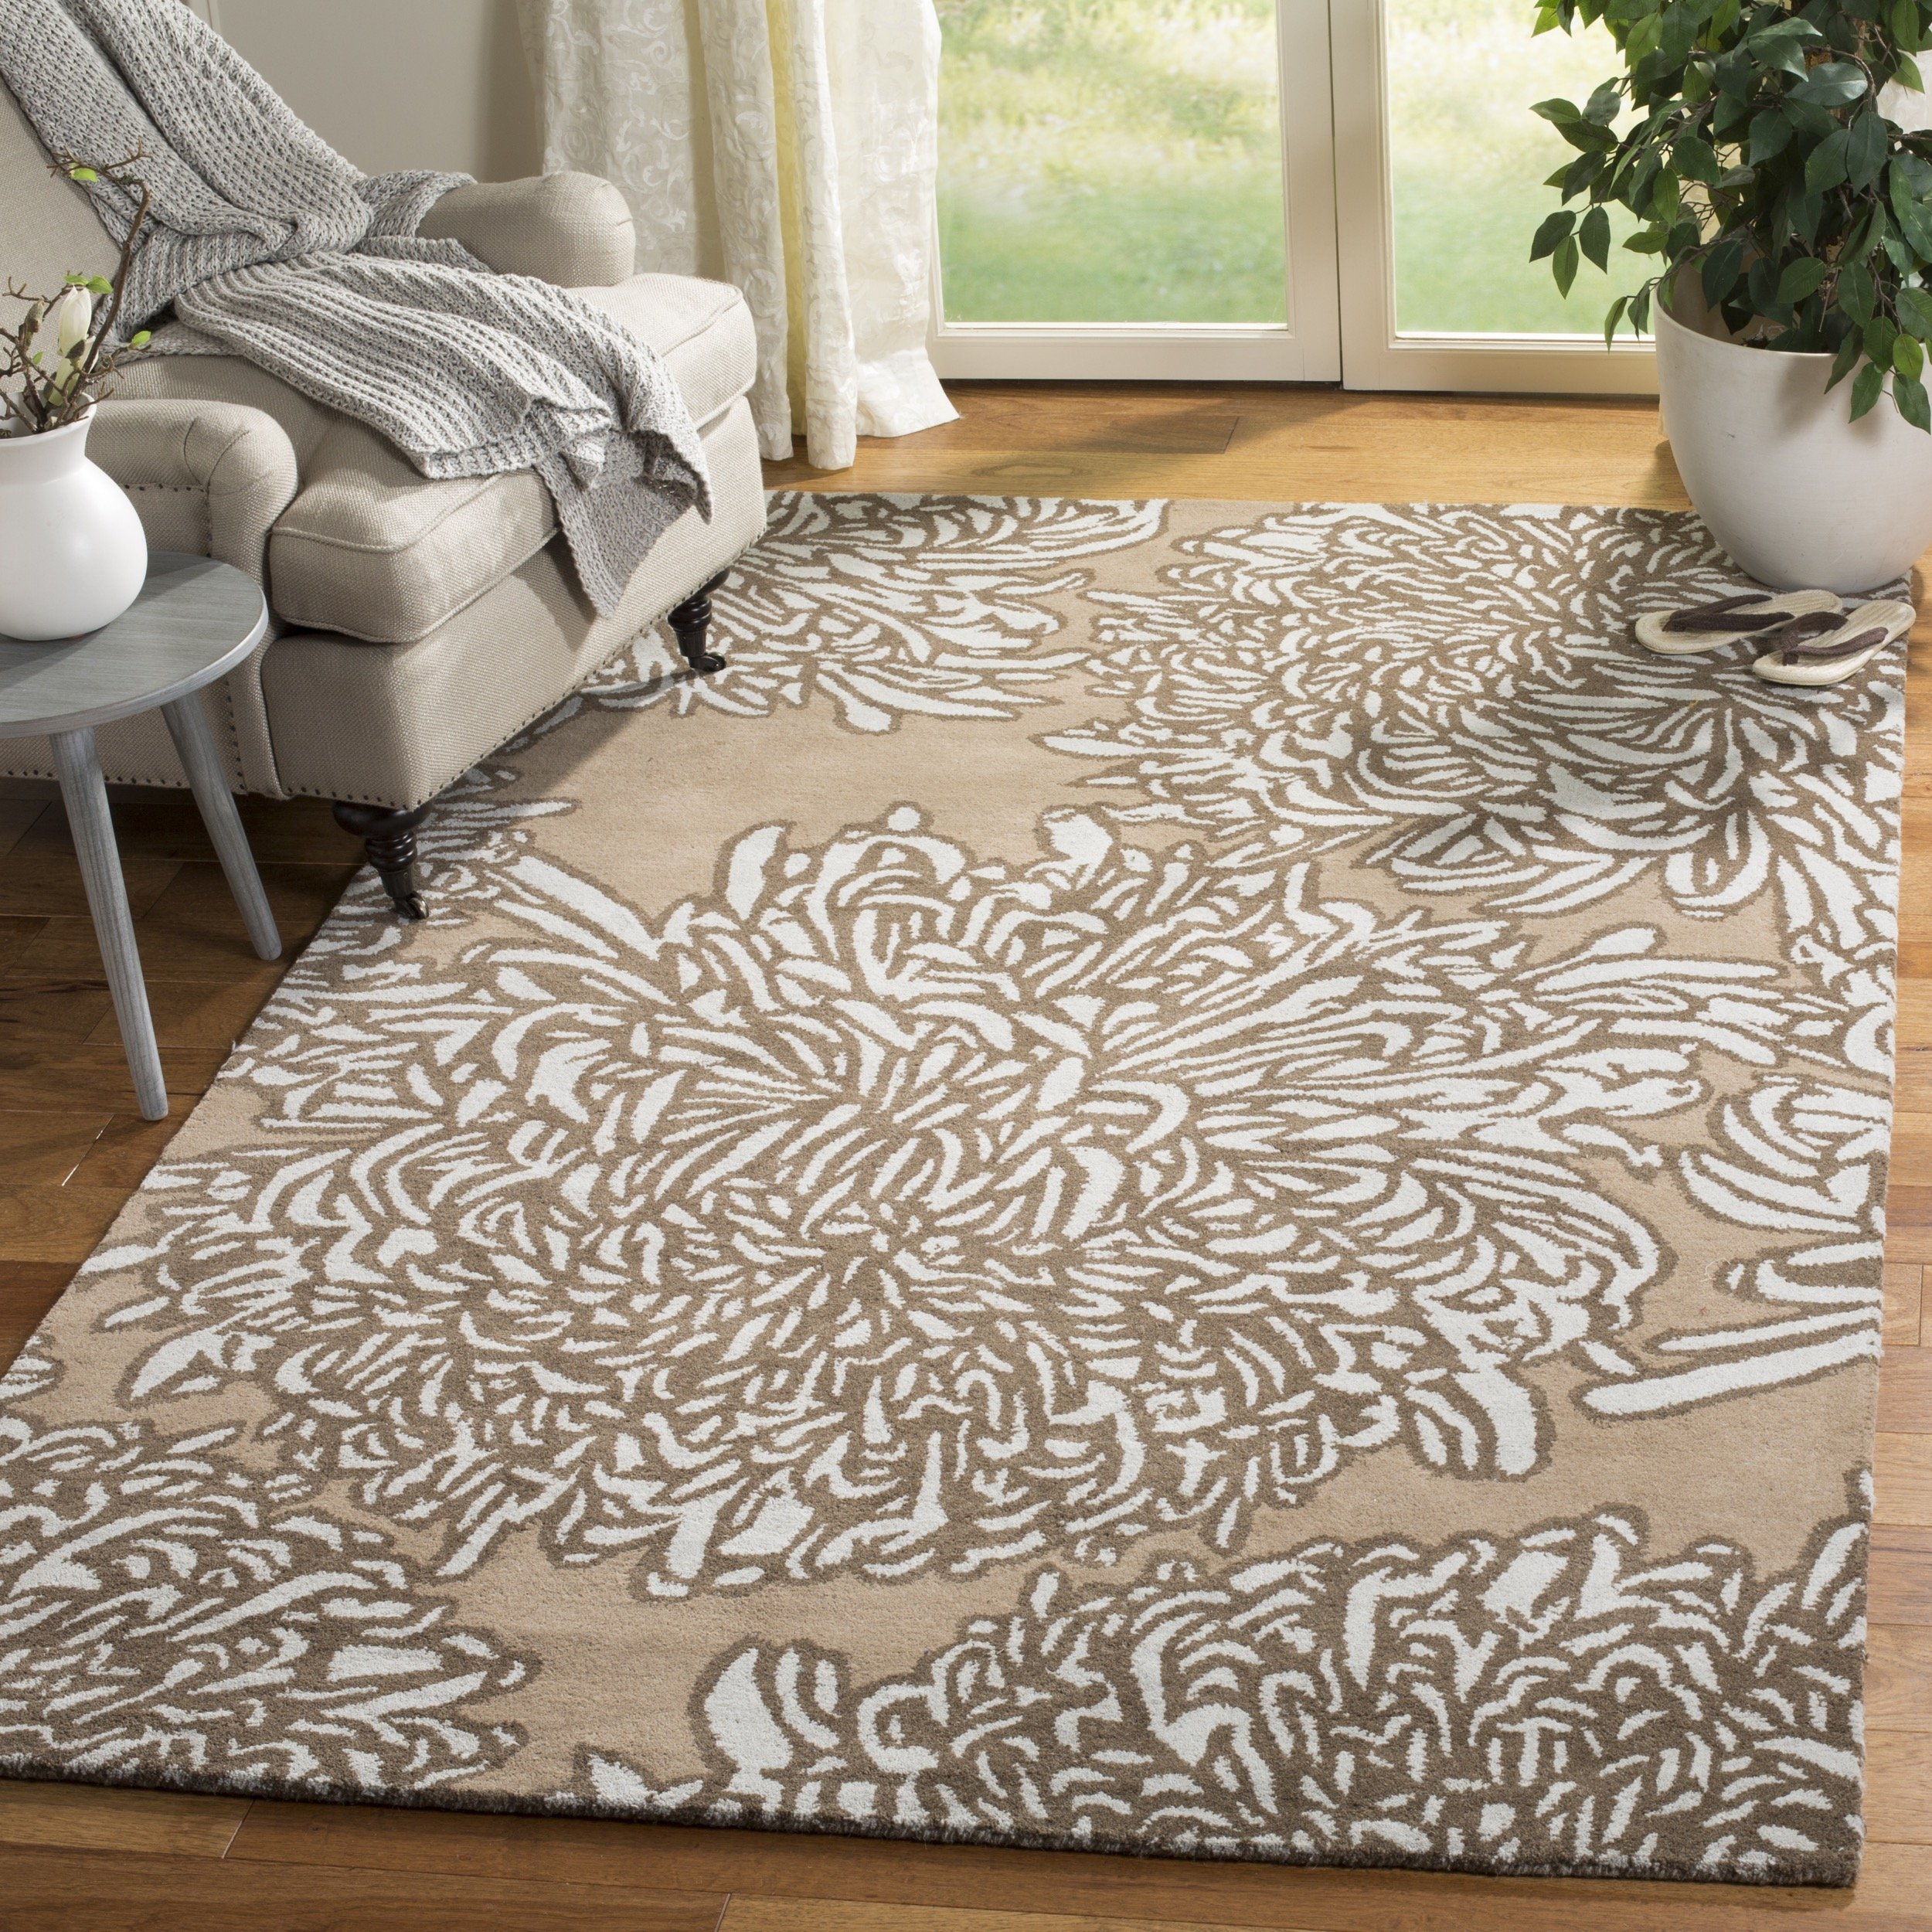 Safavieh Martha Stewart Collection MSR4542G Handmade and Grey Premium Wool Driftwood Area Rug (4' x 6')